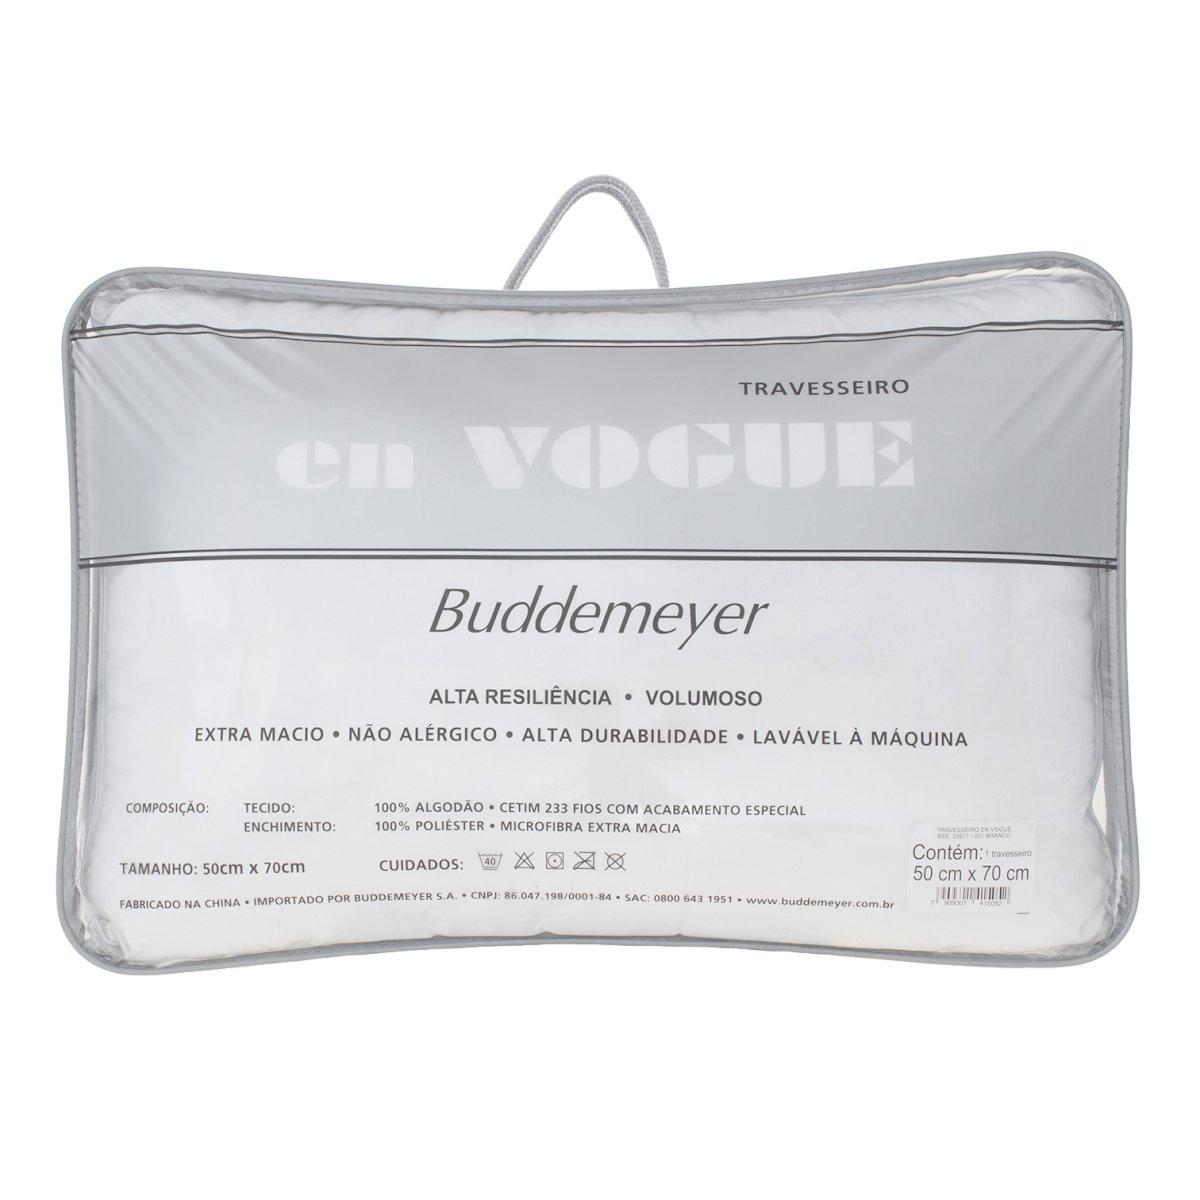 Kit 2 Travesseiros En Vogue Cetim 233 Fios Buddemeyer